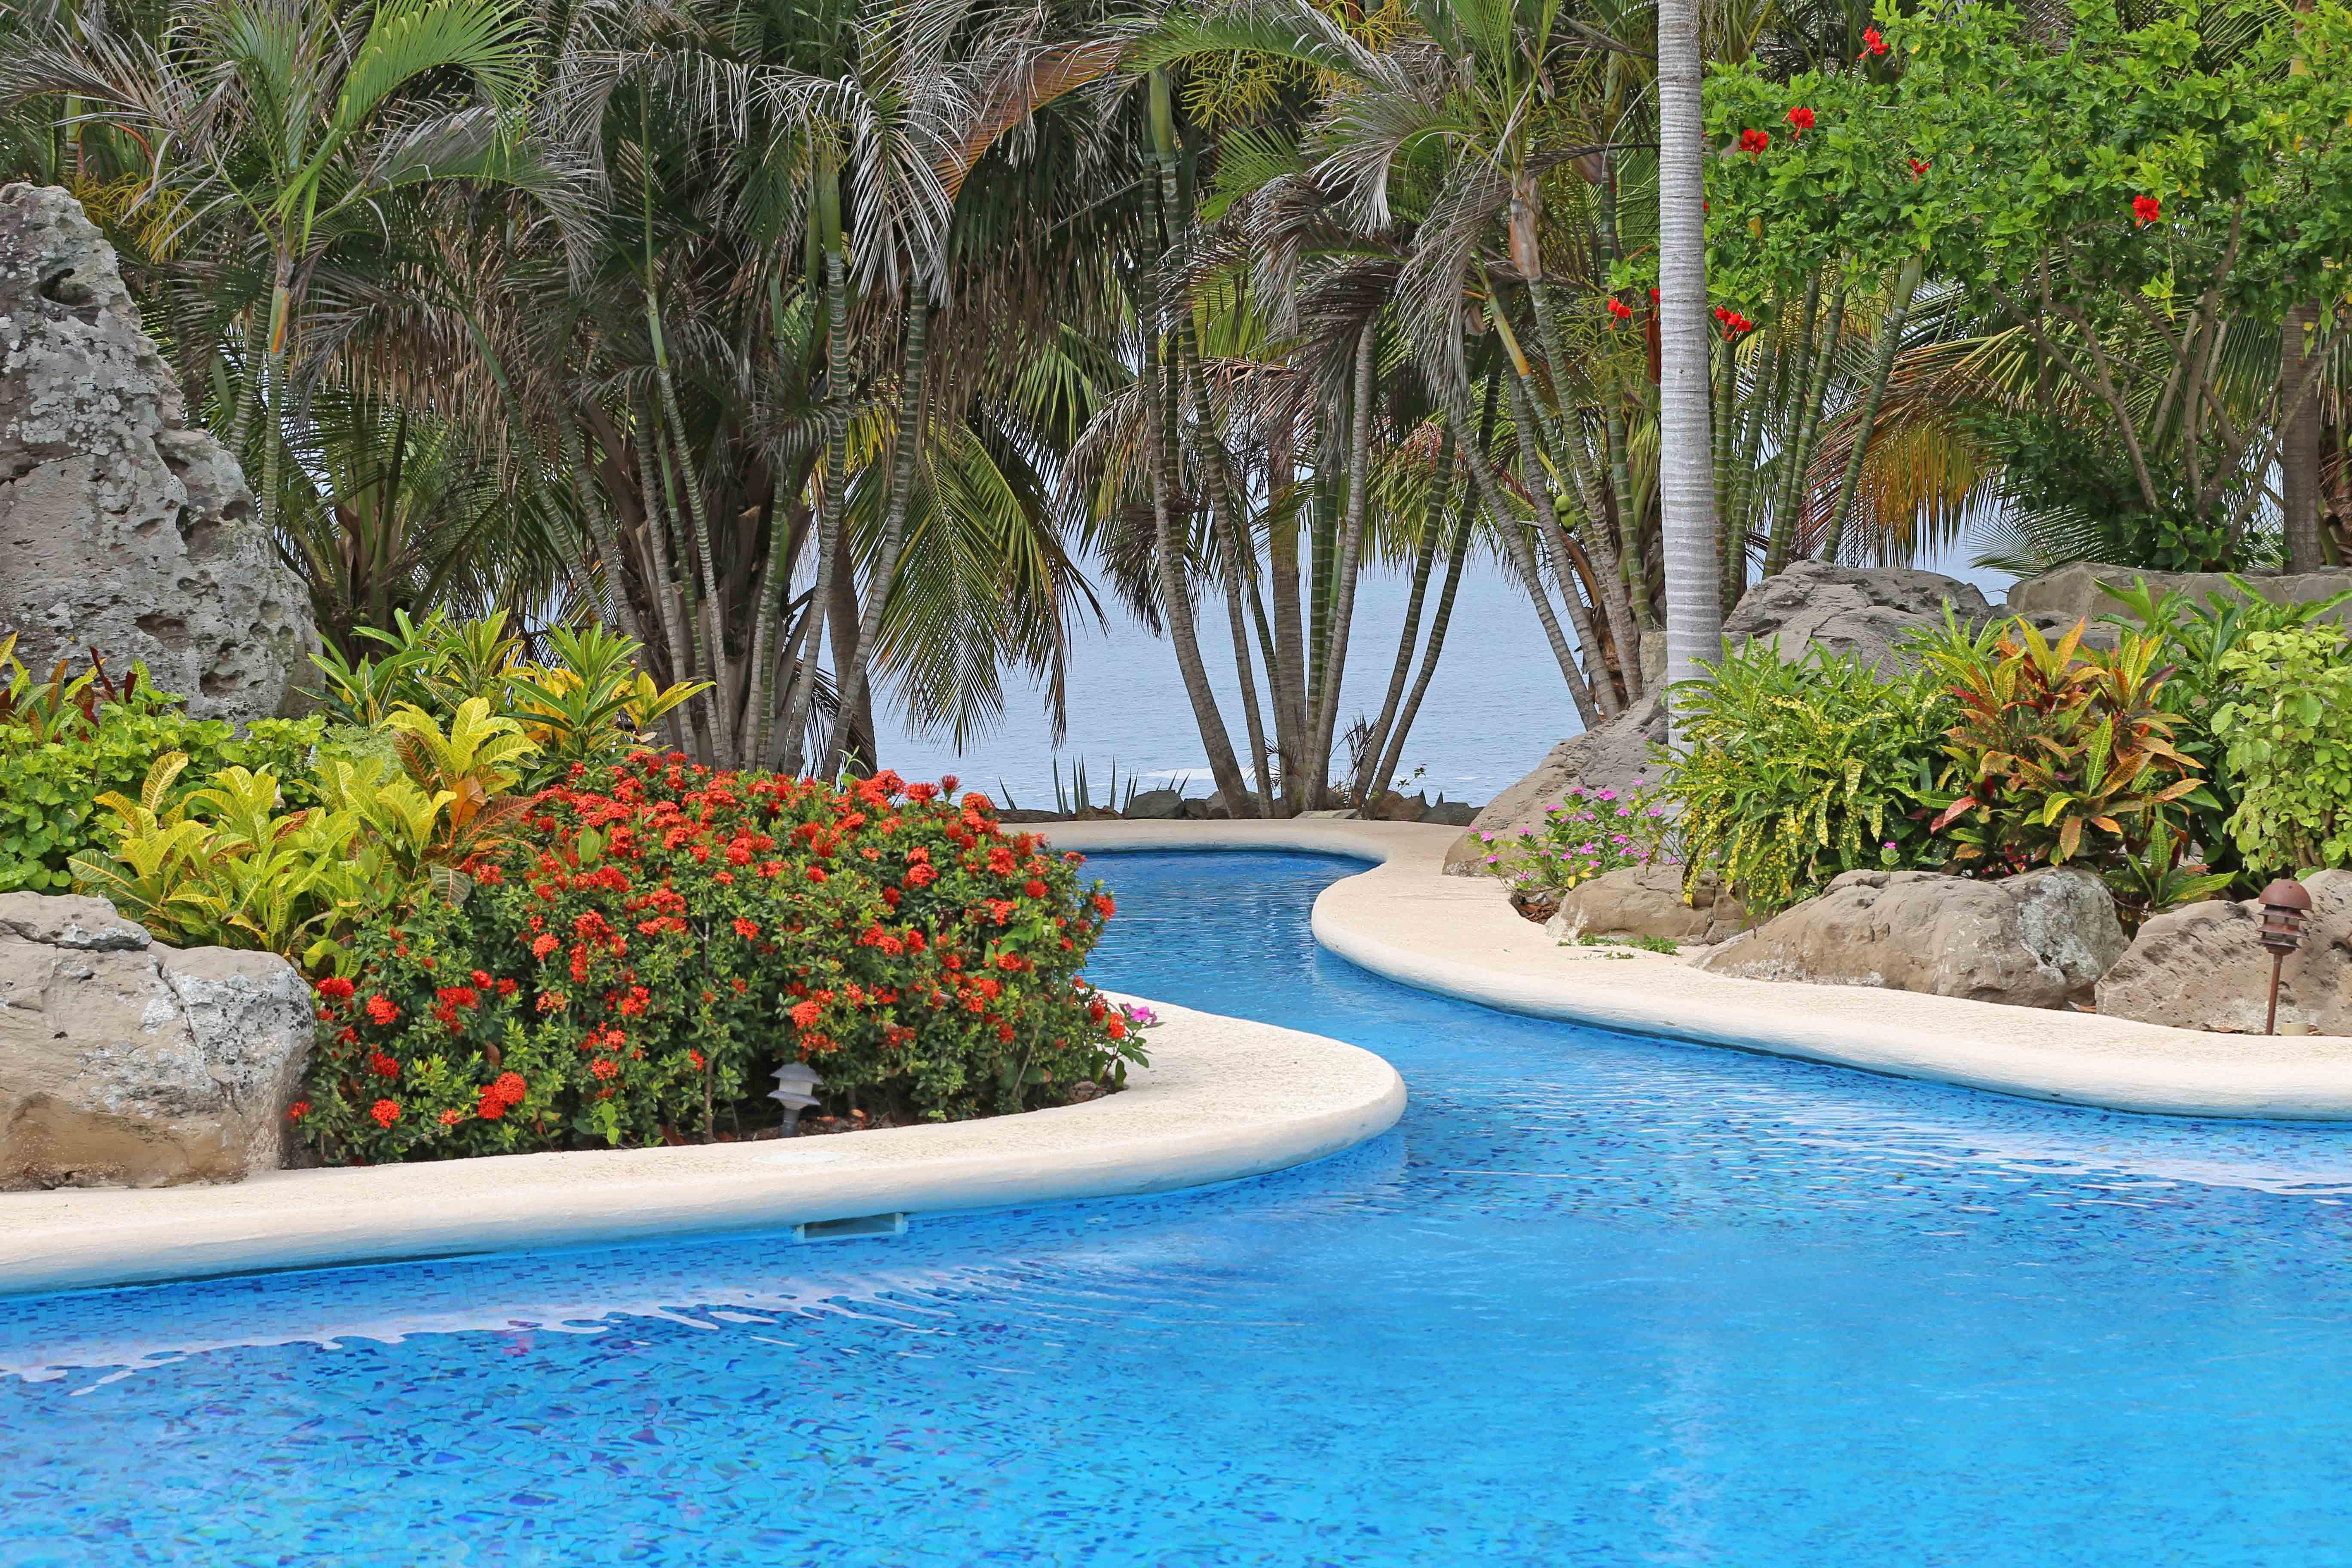 Scenic point pool